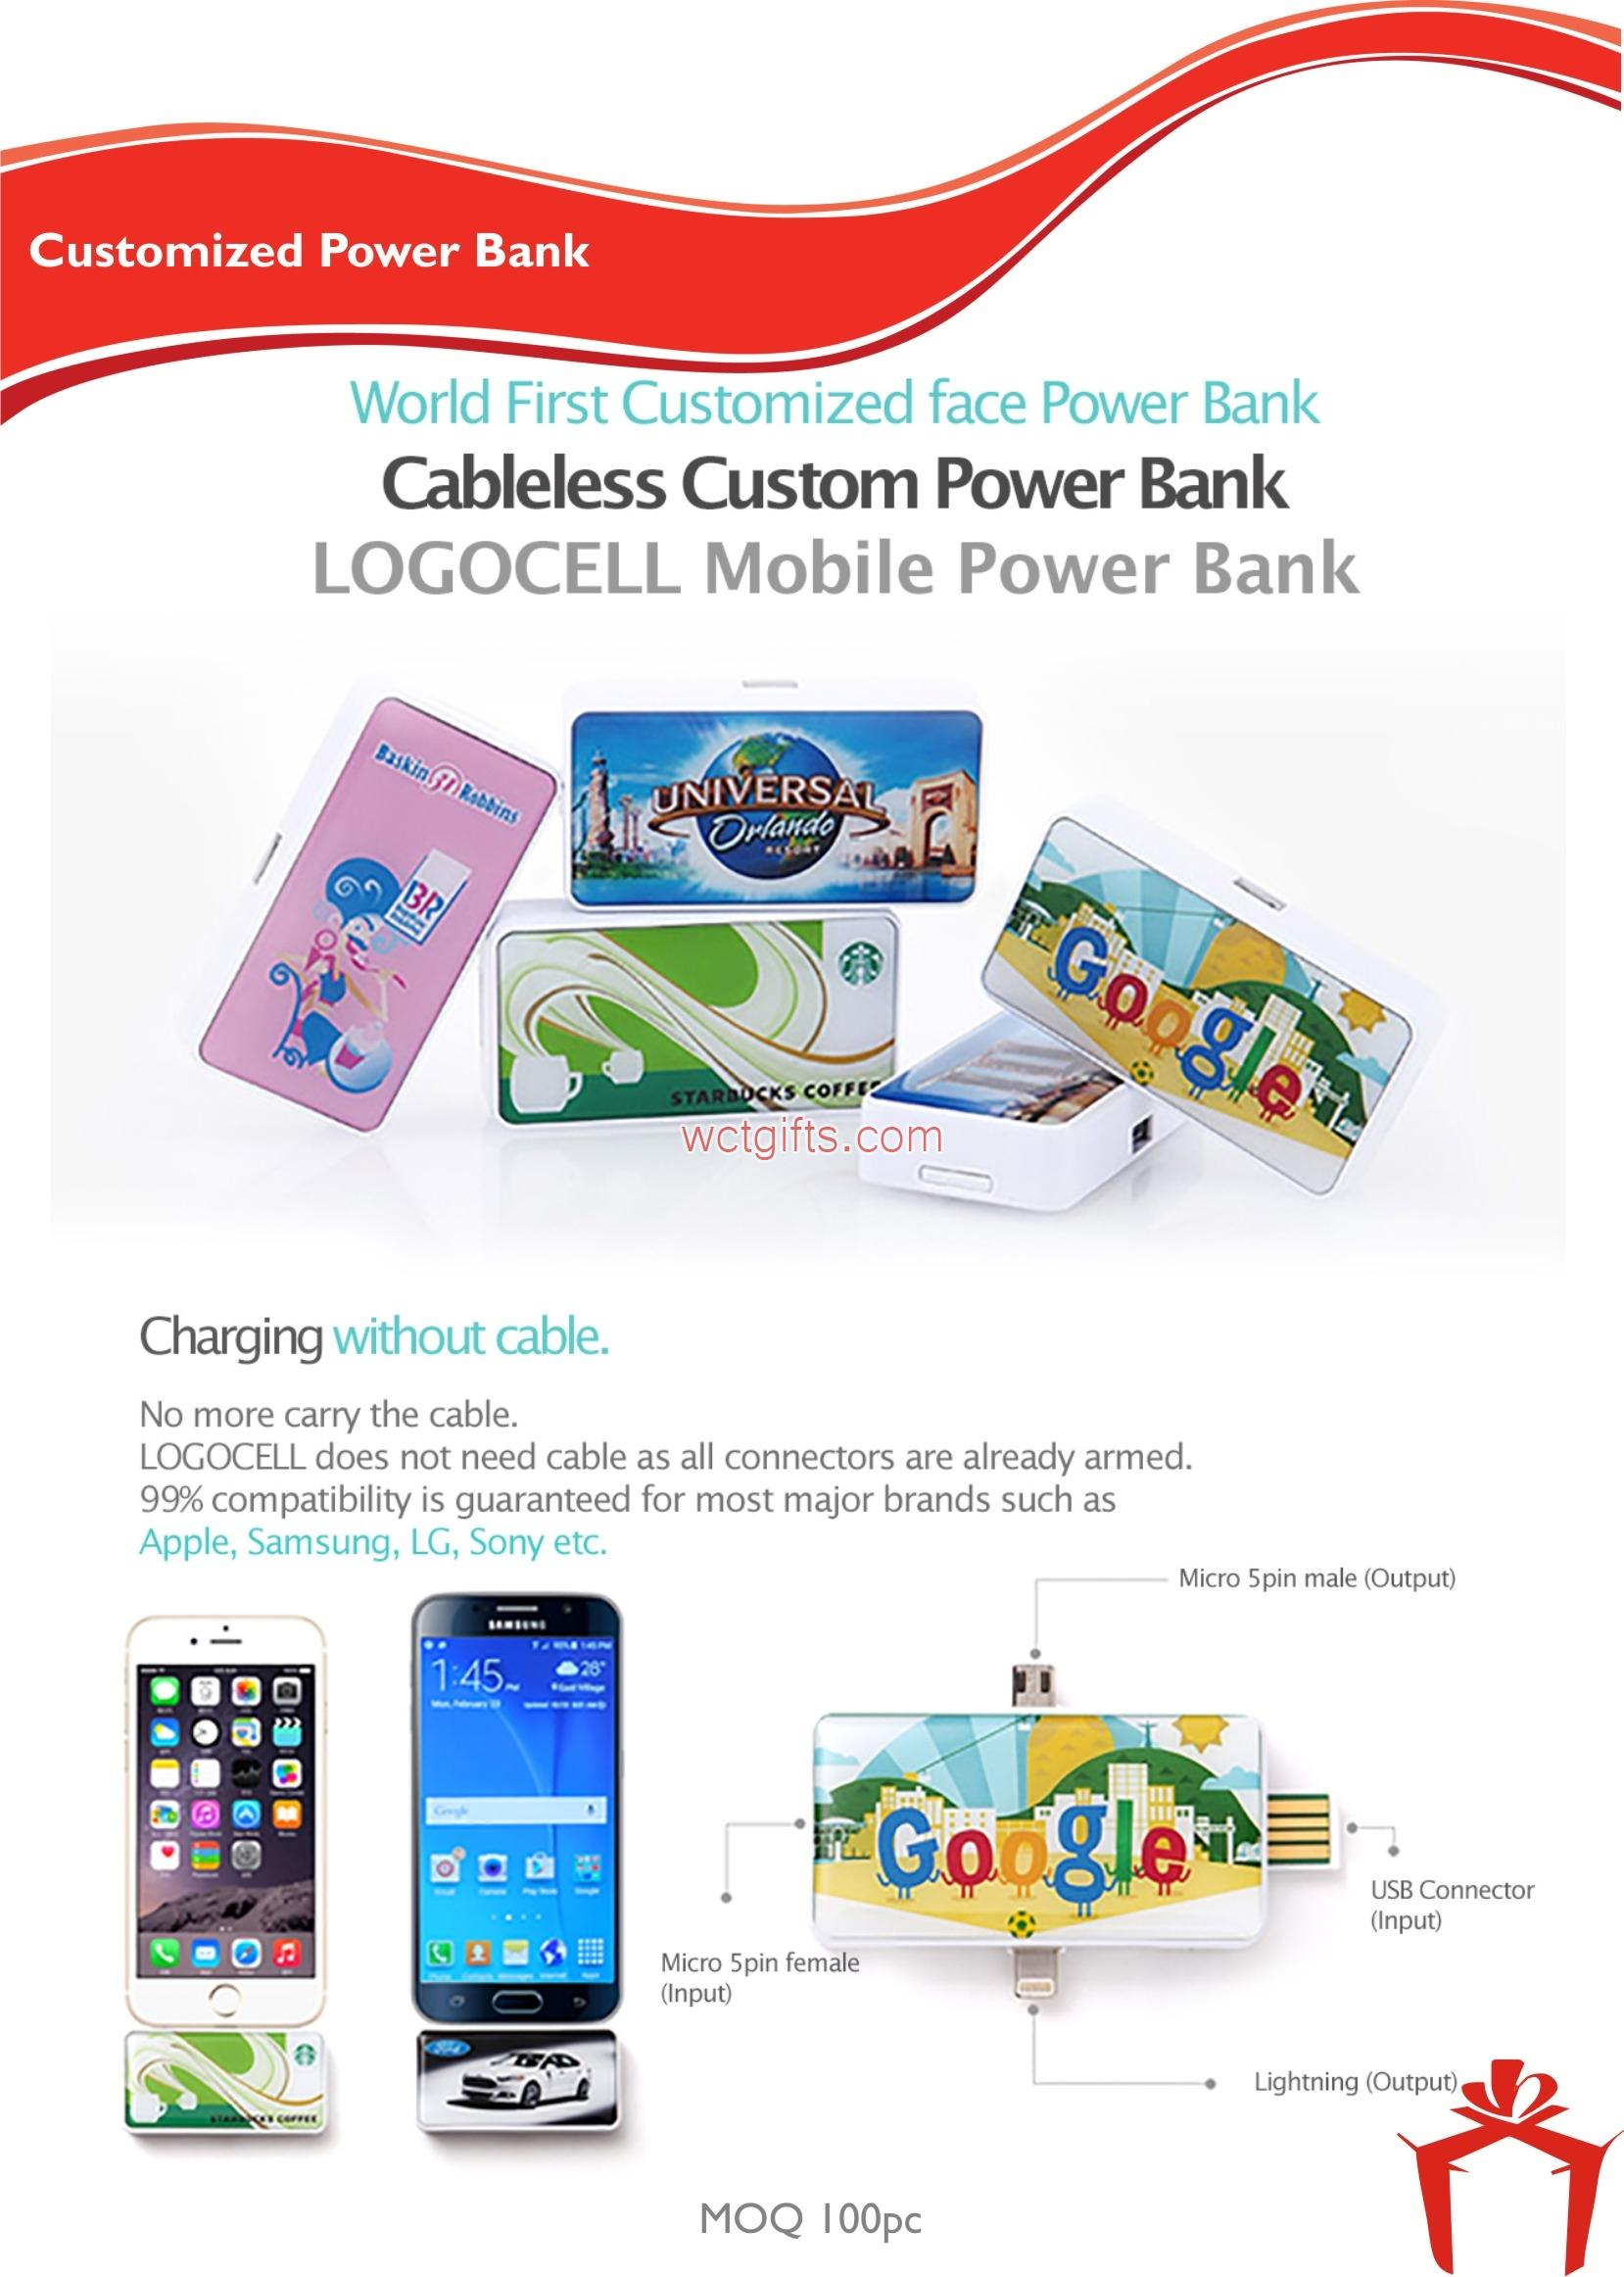 Customized Power Bank